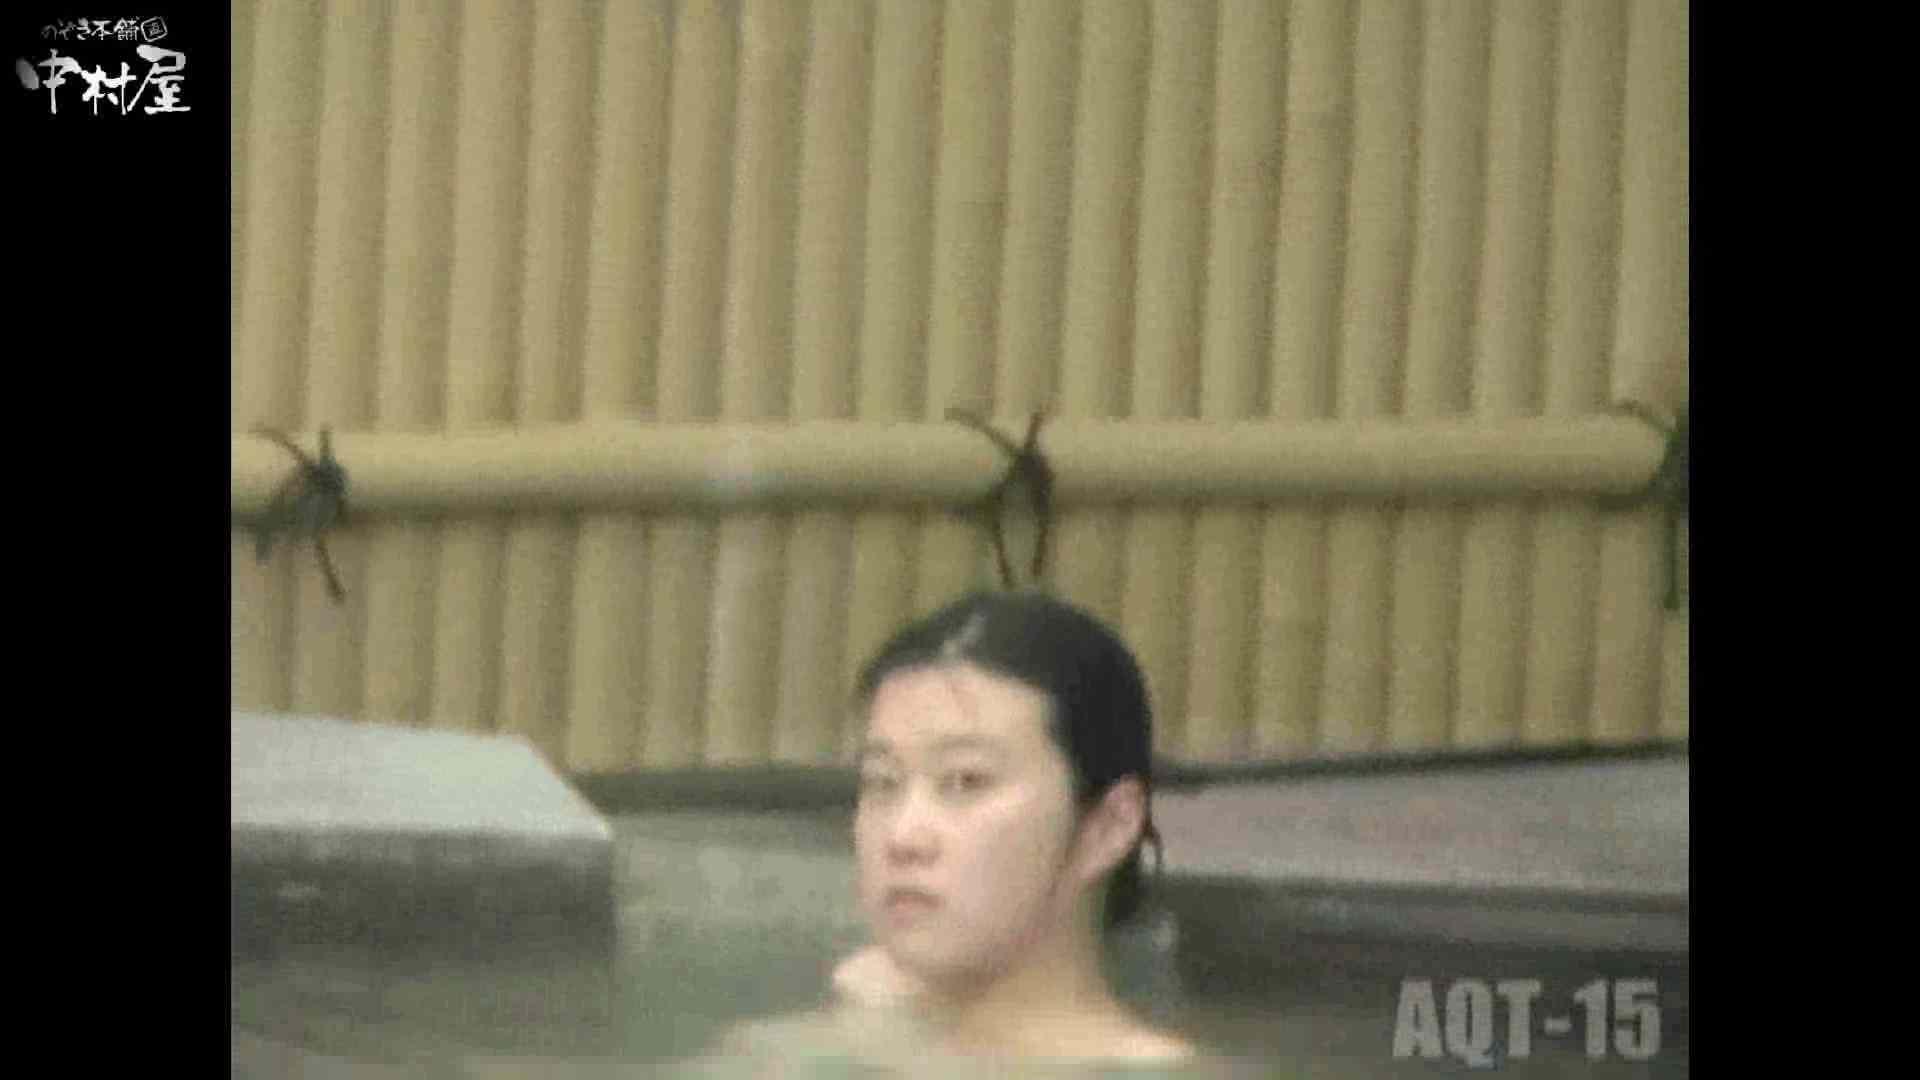 Aquaな露天風呂Vol.878潜入盗撮露天風呂十五判湯 其の三 潜入 | 盗撮  87画像 53